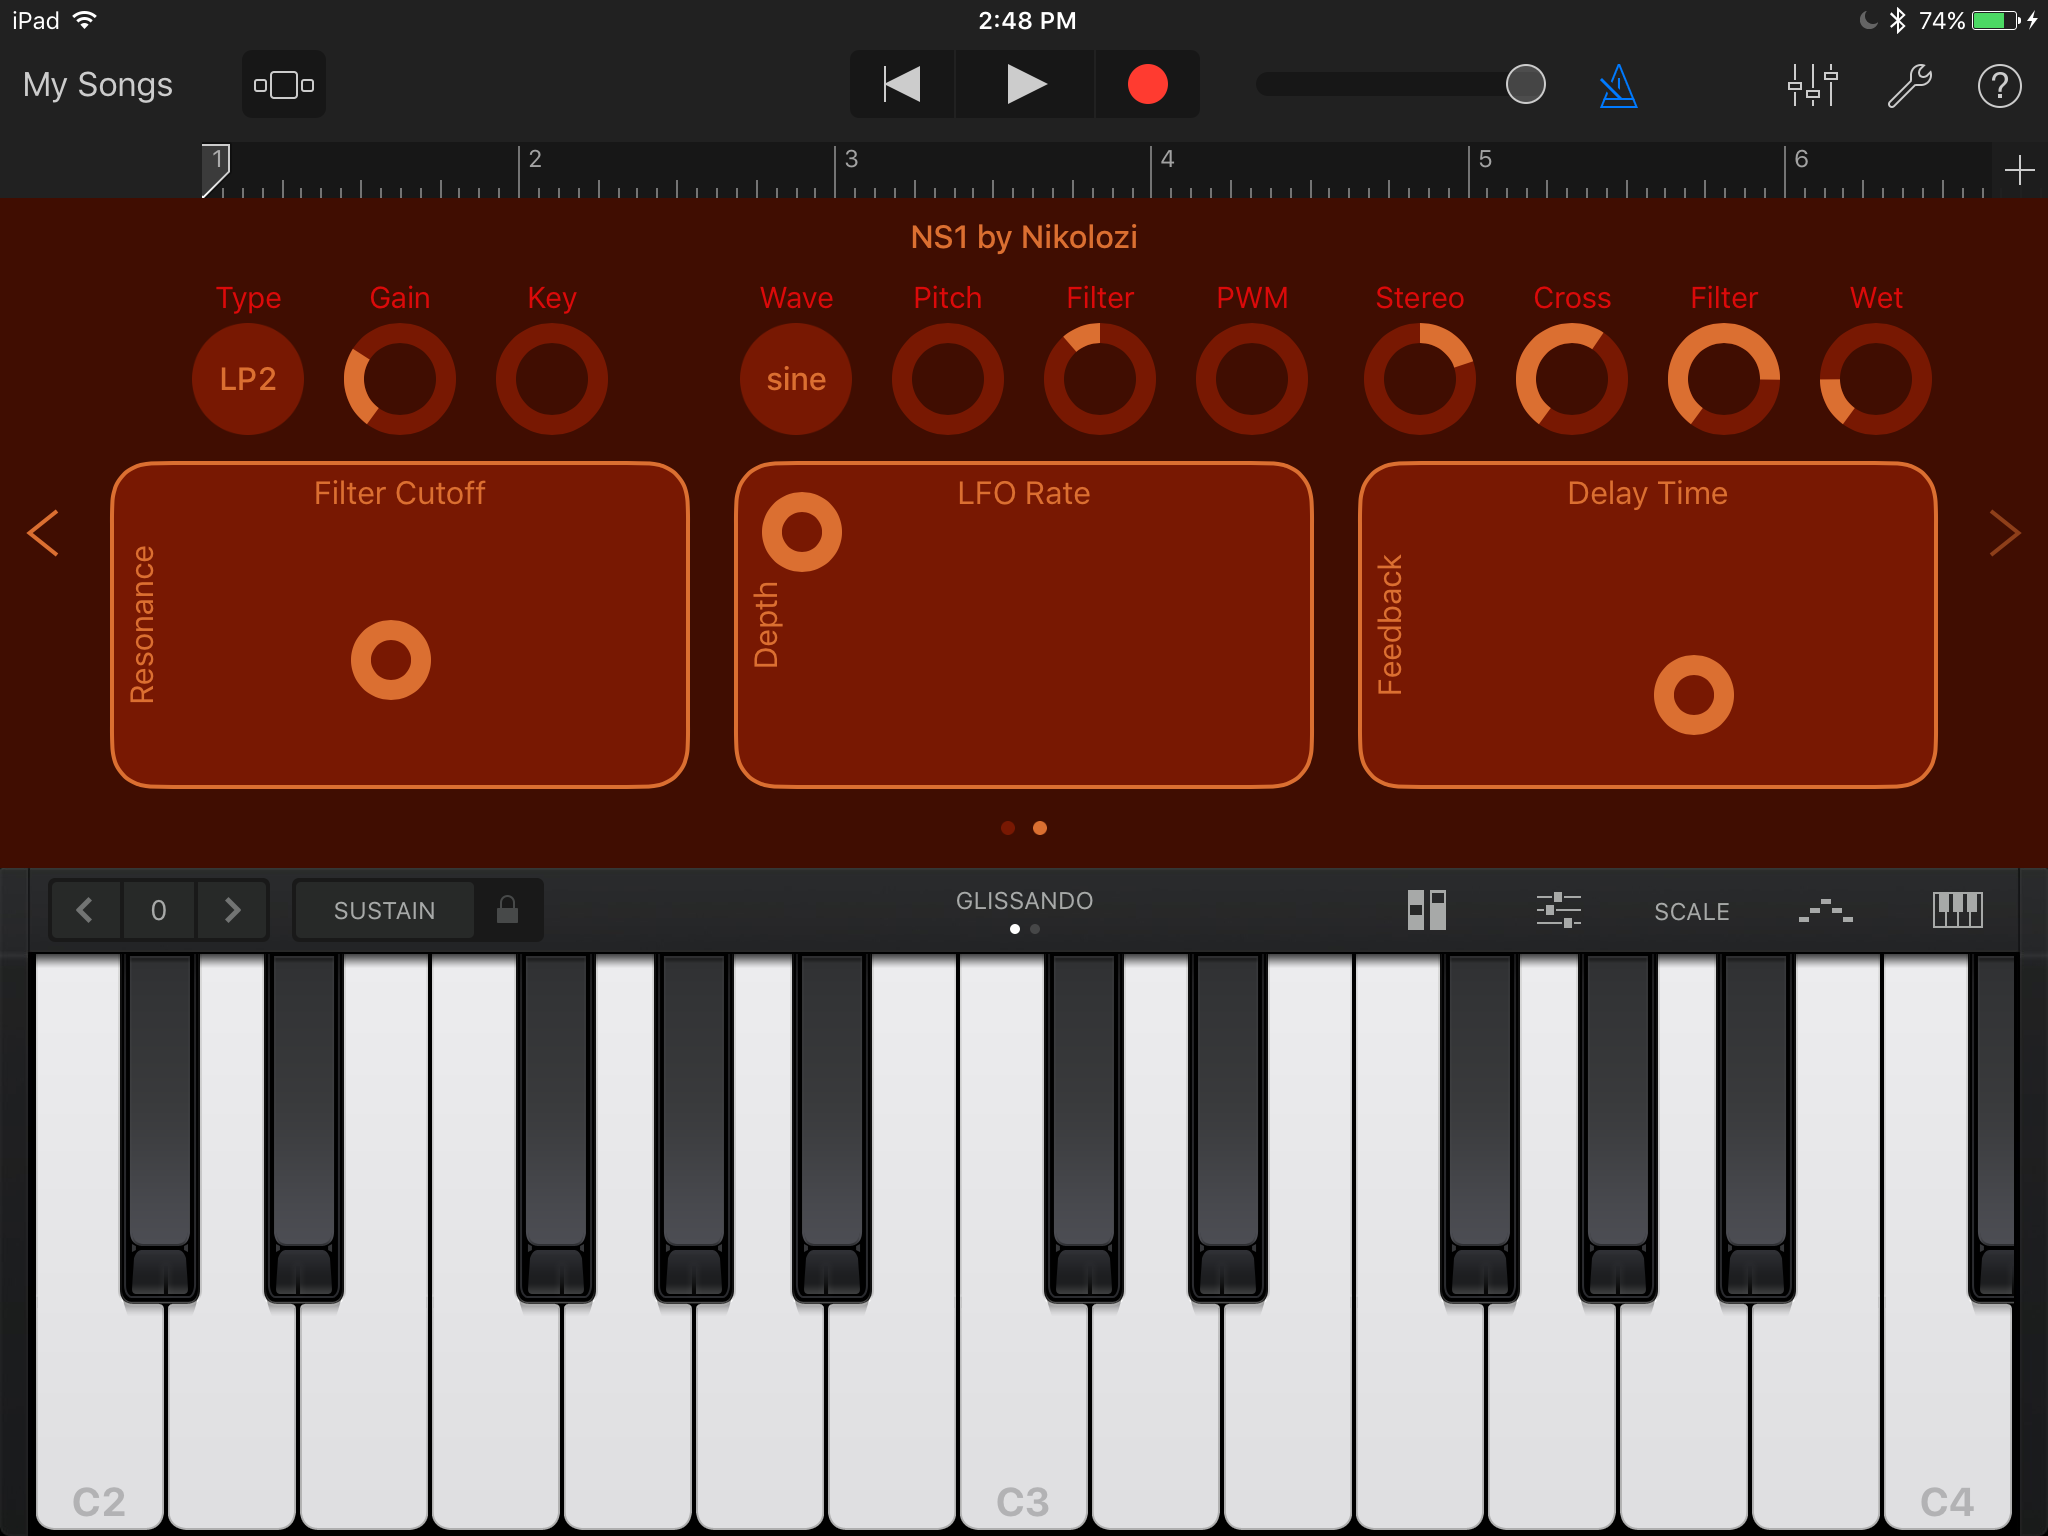 iPadAir_4.png